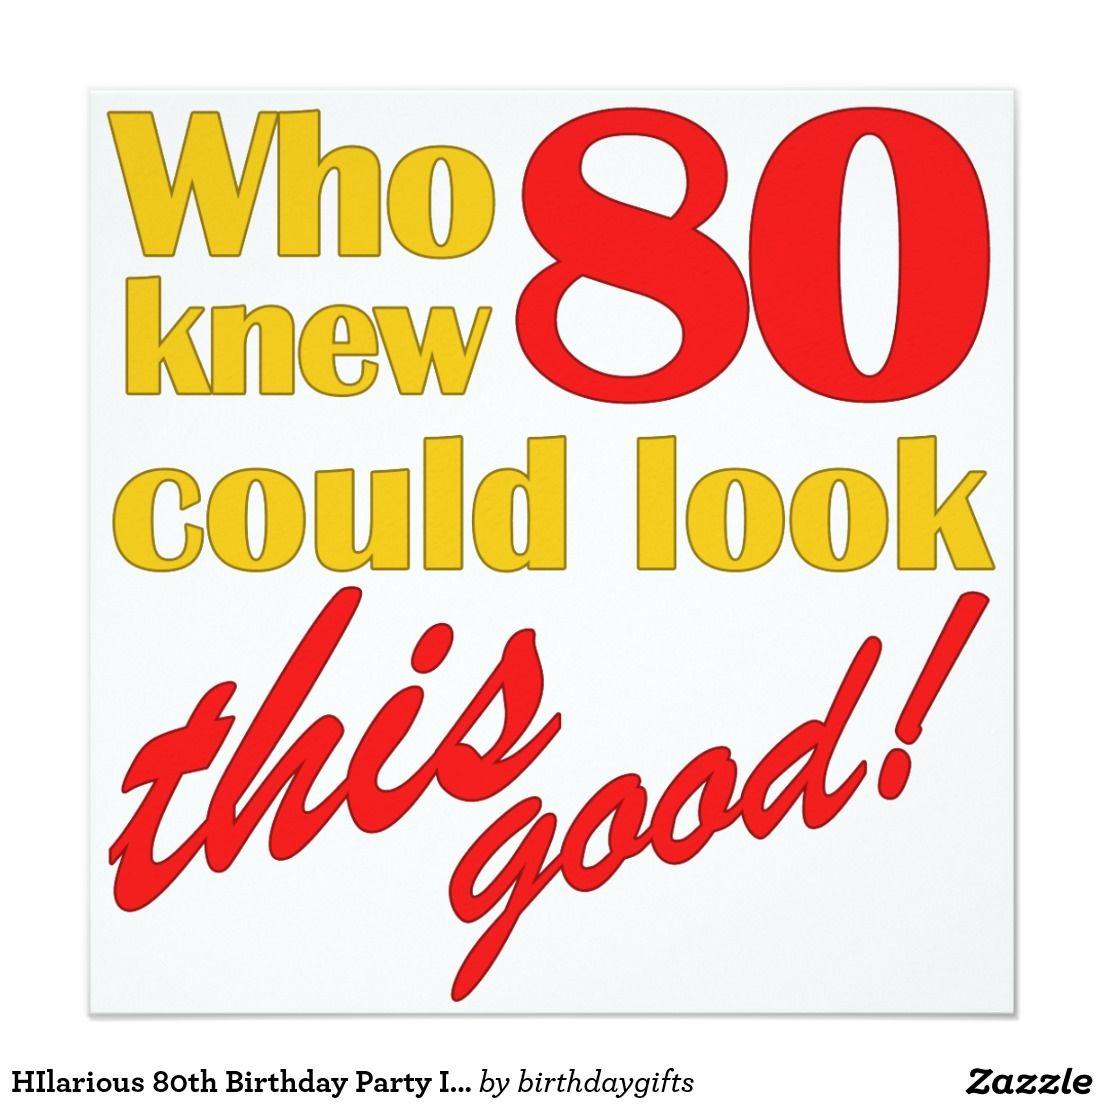 HIlarious 80th Birthday Party Invitations   80 birthday